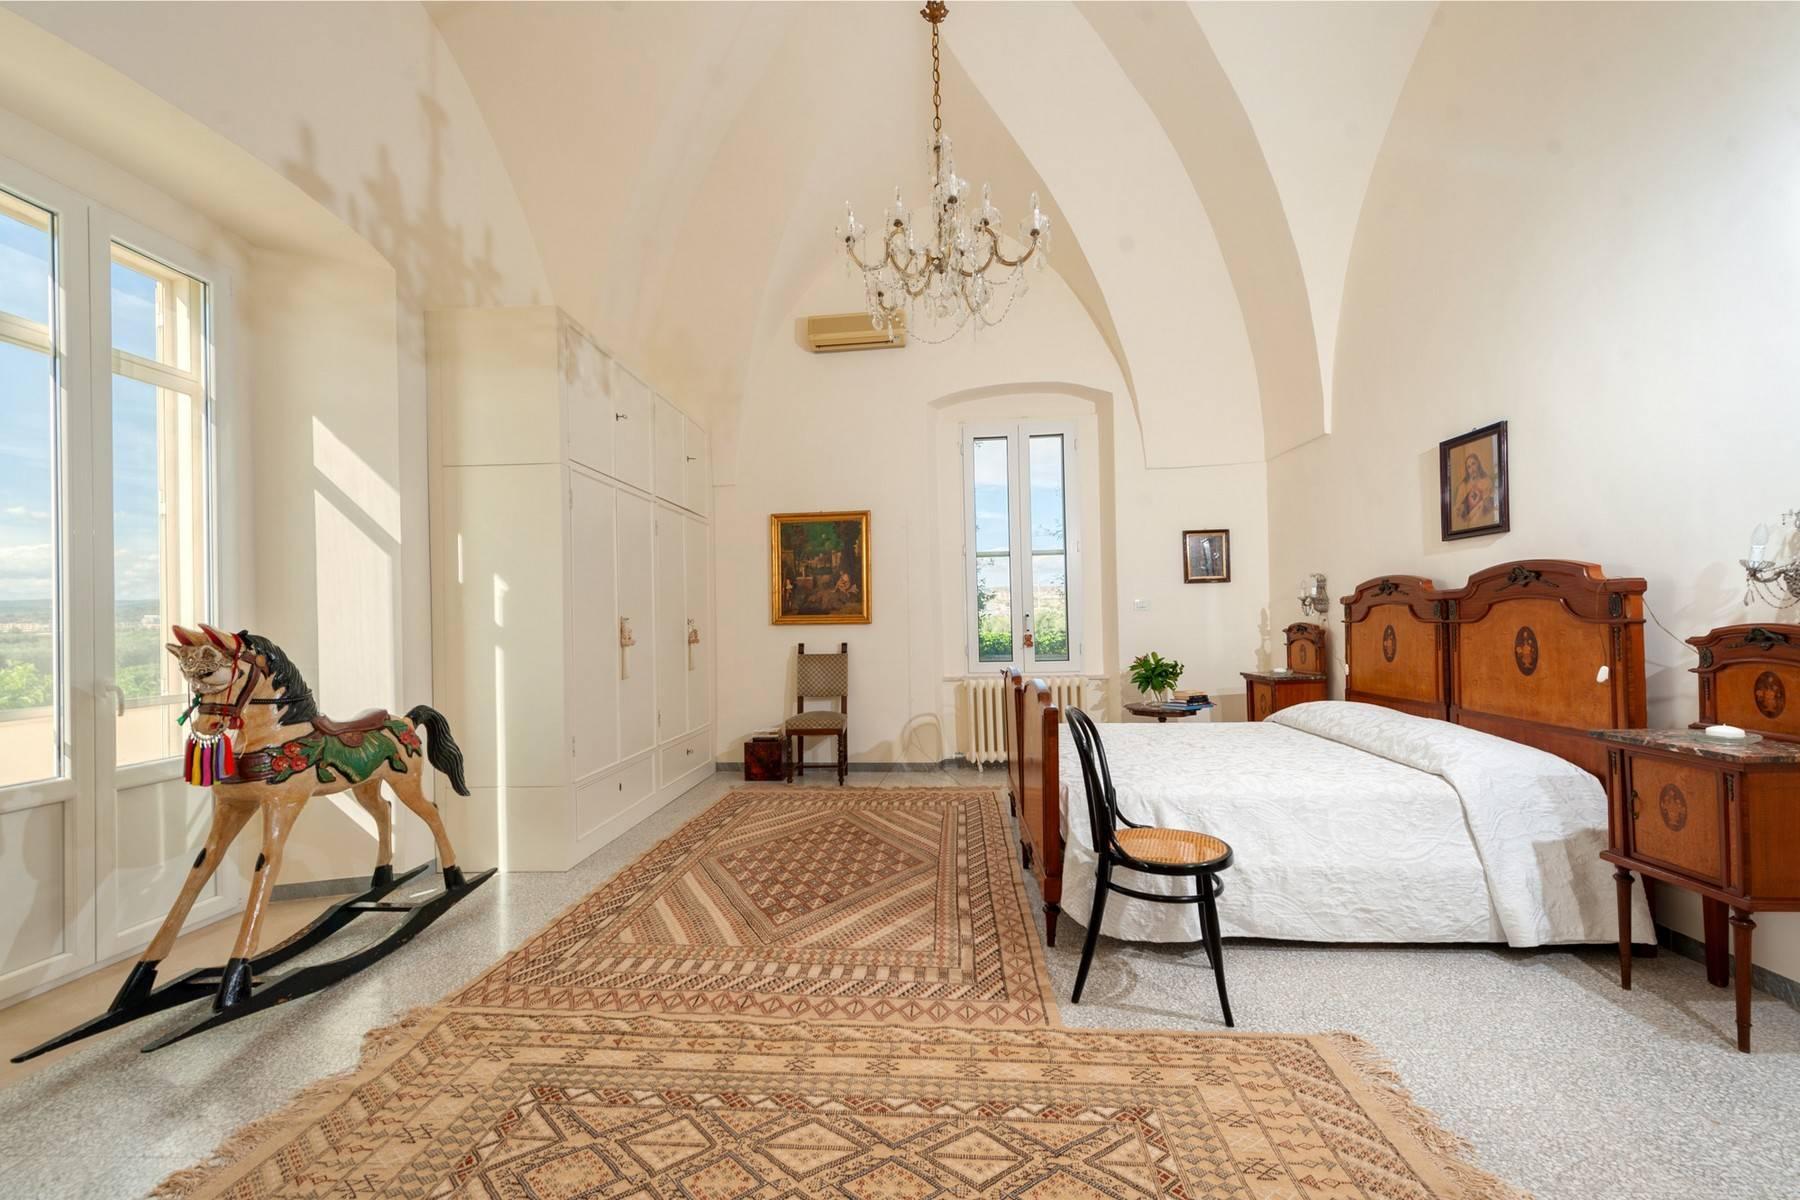 Splendida villa gentilizia del '600 circondata da agrumeti - 26